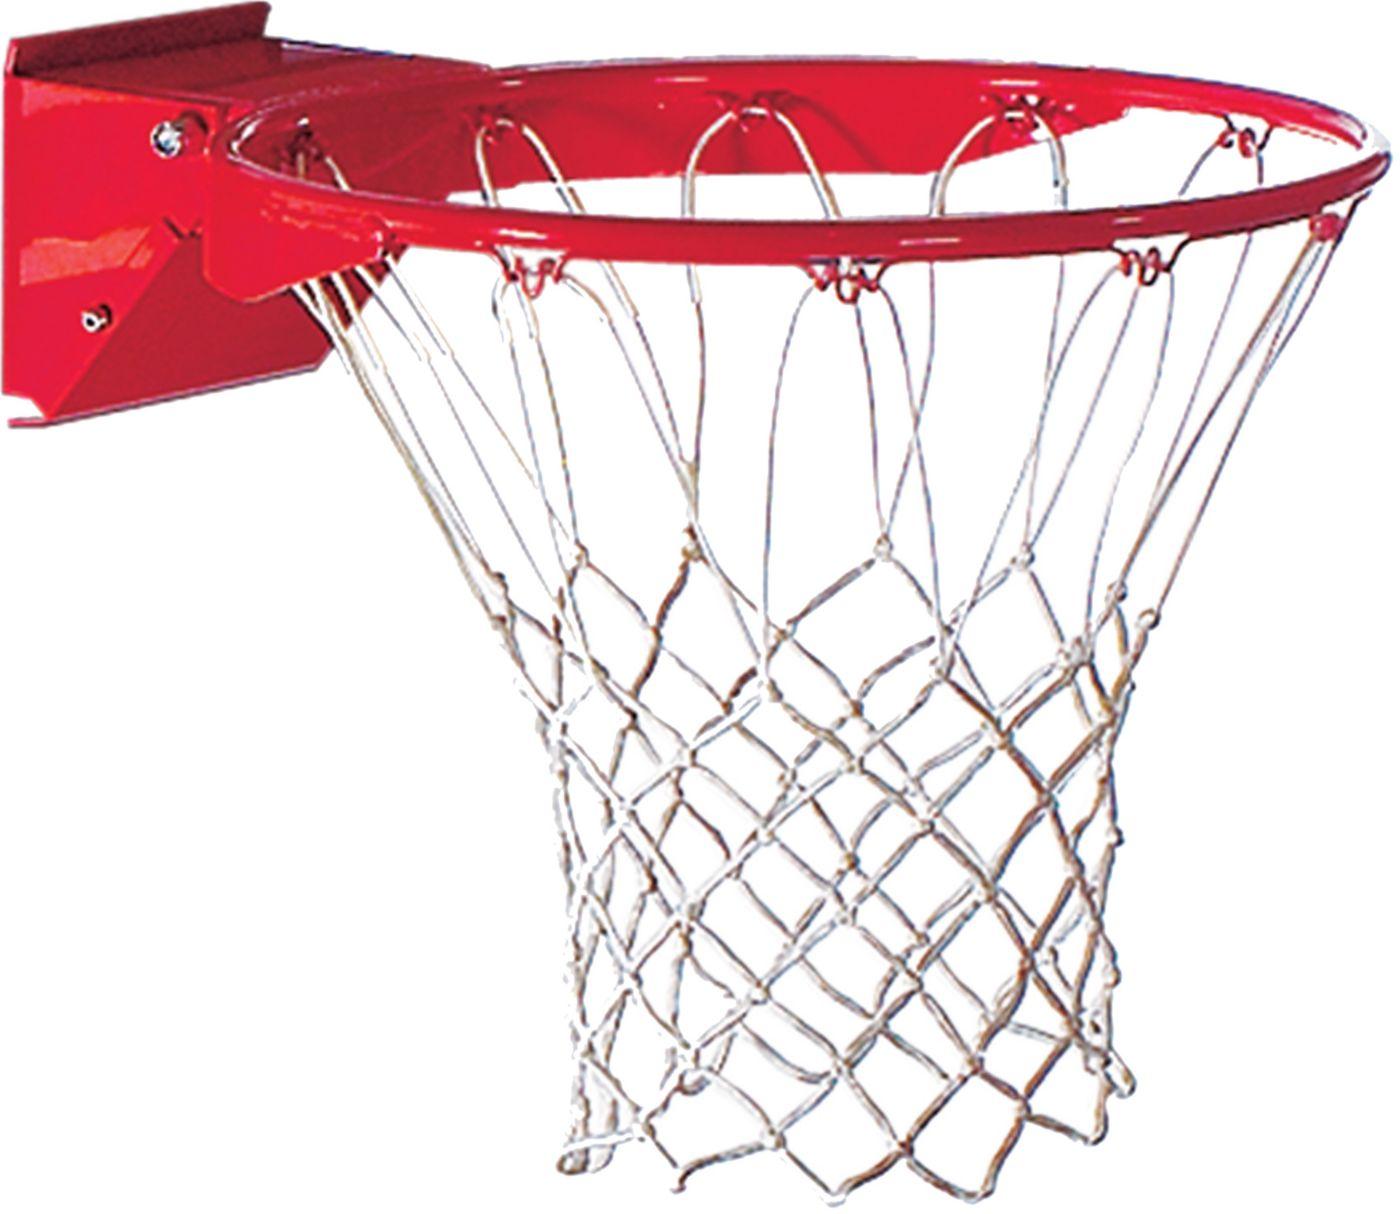 Spalding Pro Image NCAA Breakaway Rim - Red